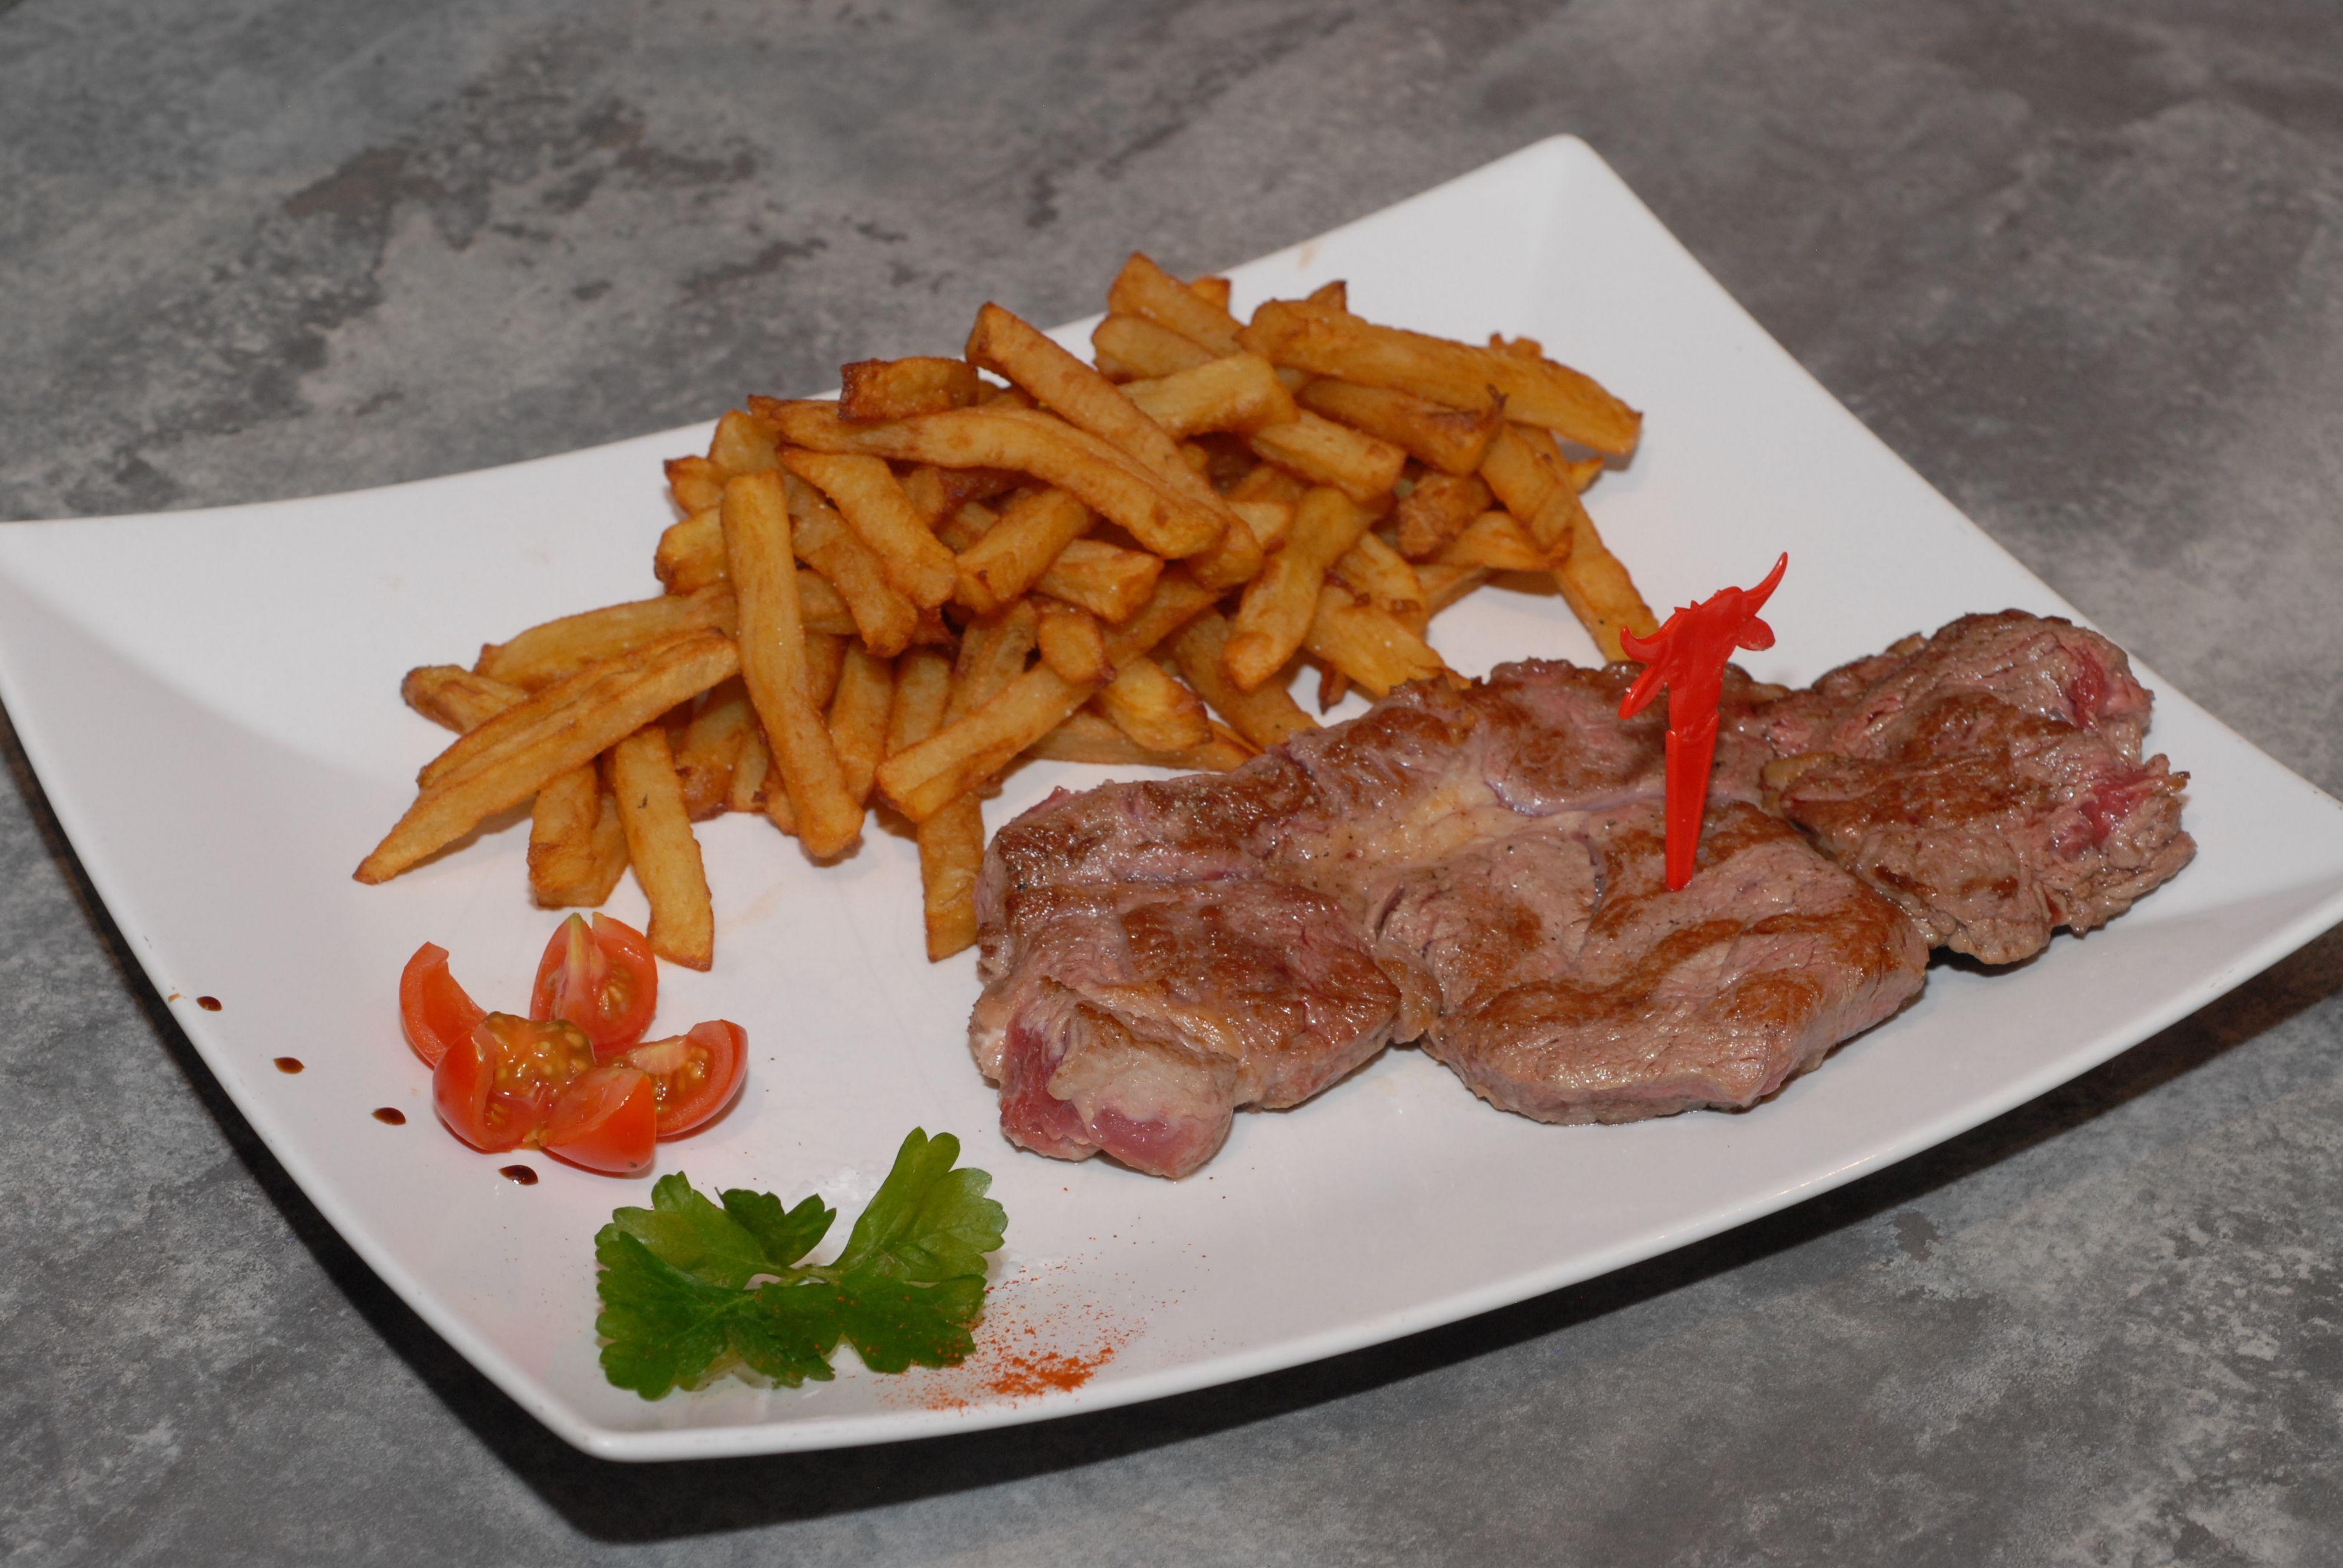 restaurant-pizzeria-echirolles-plat-principal